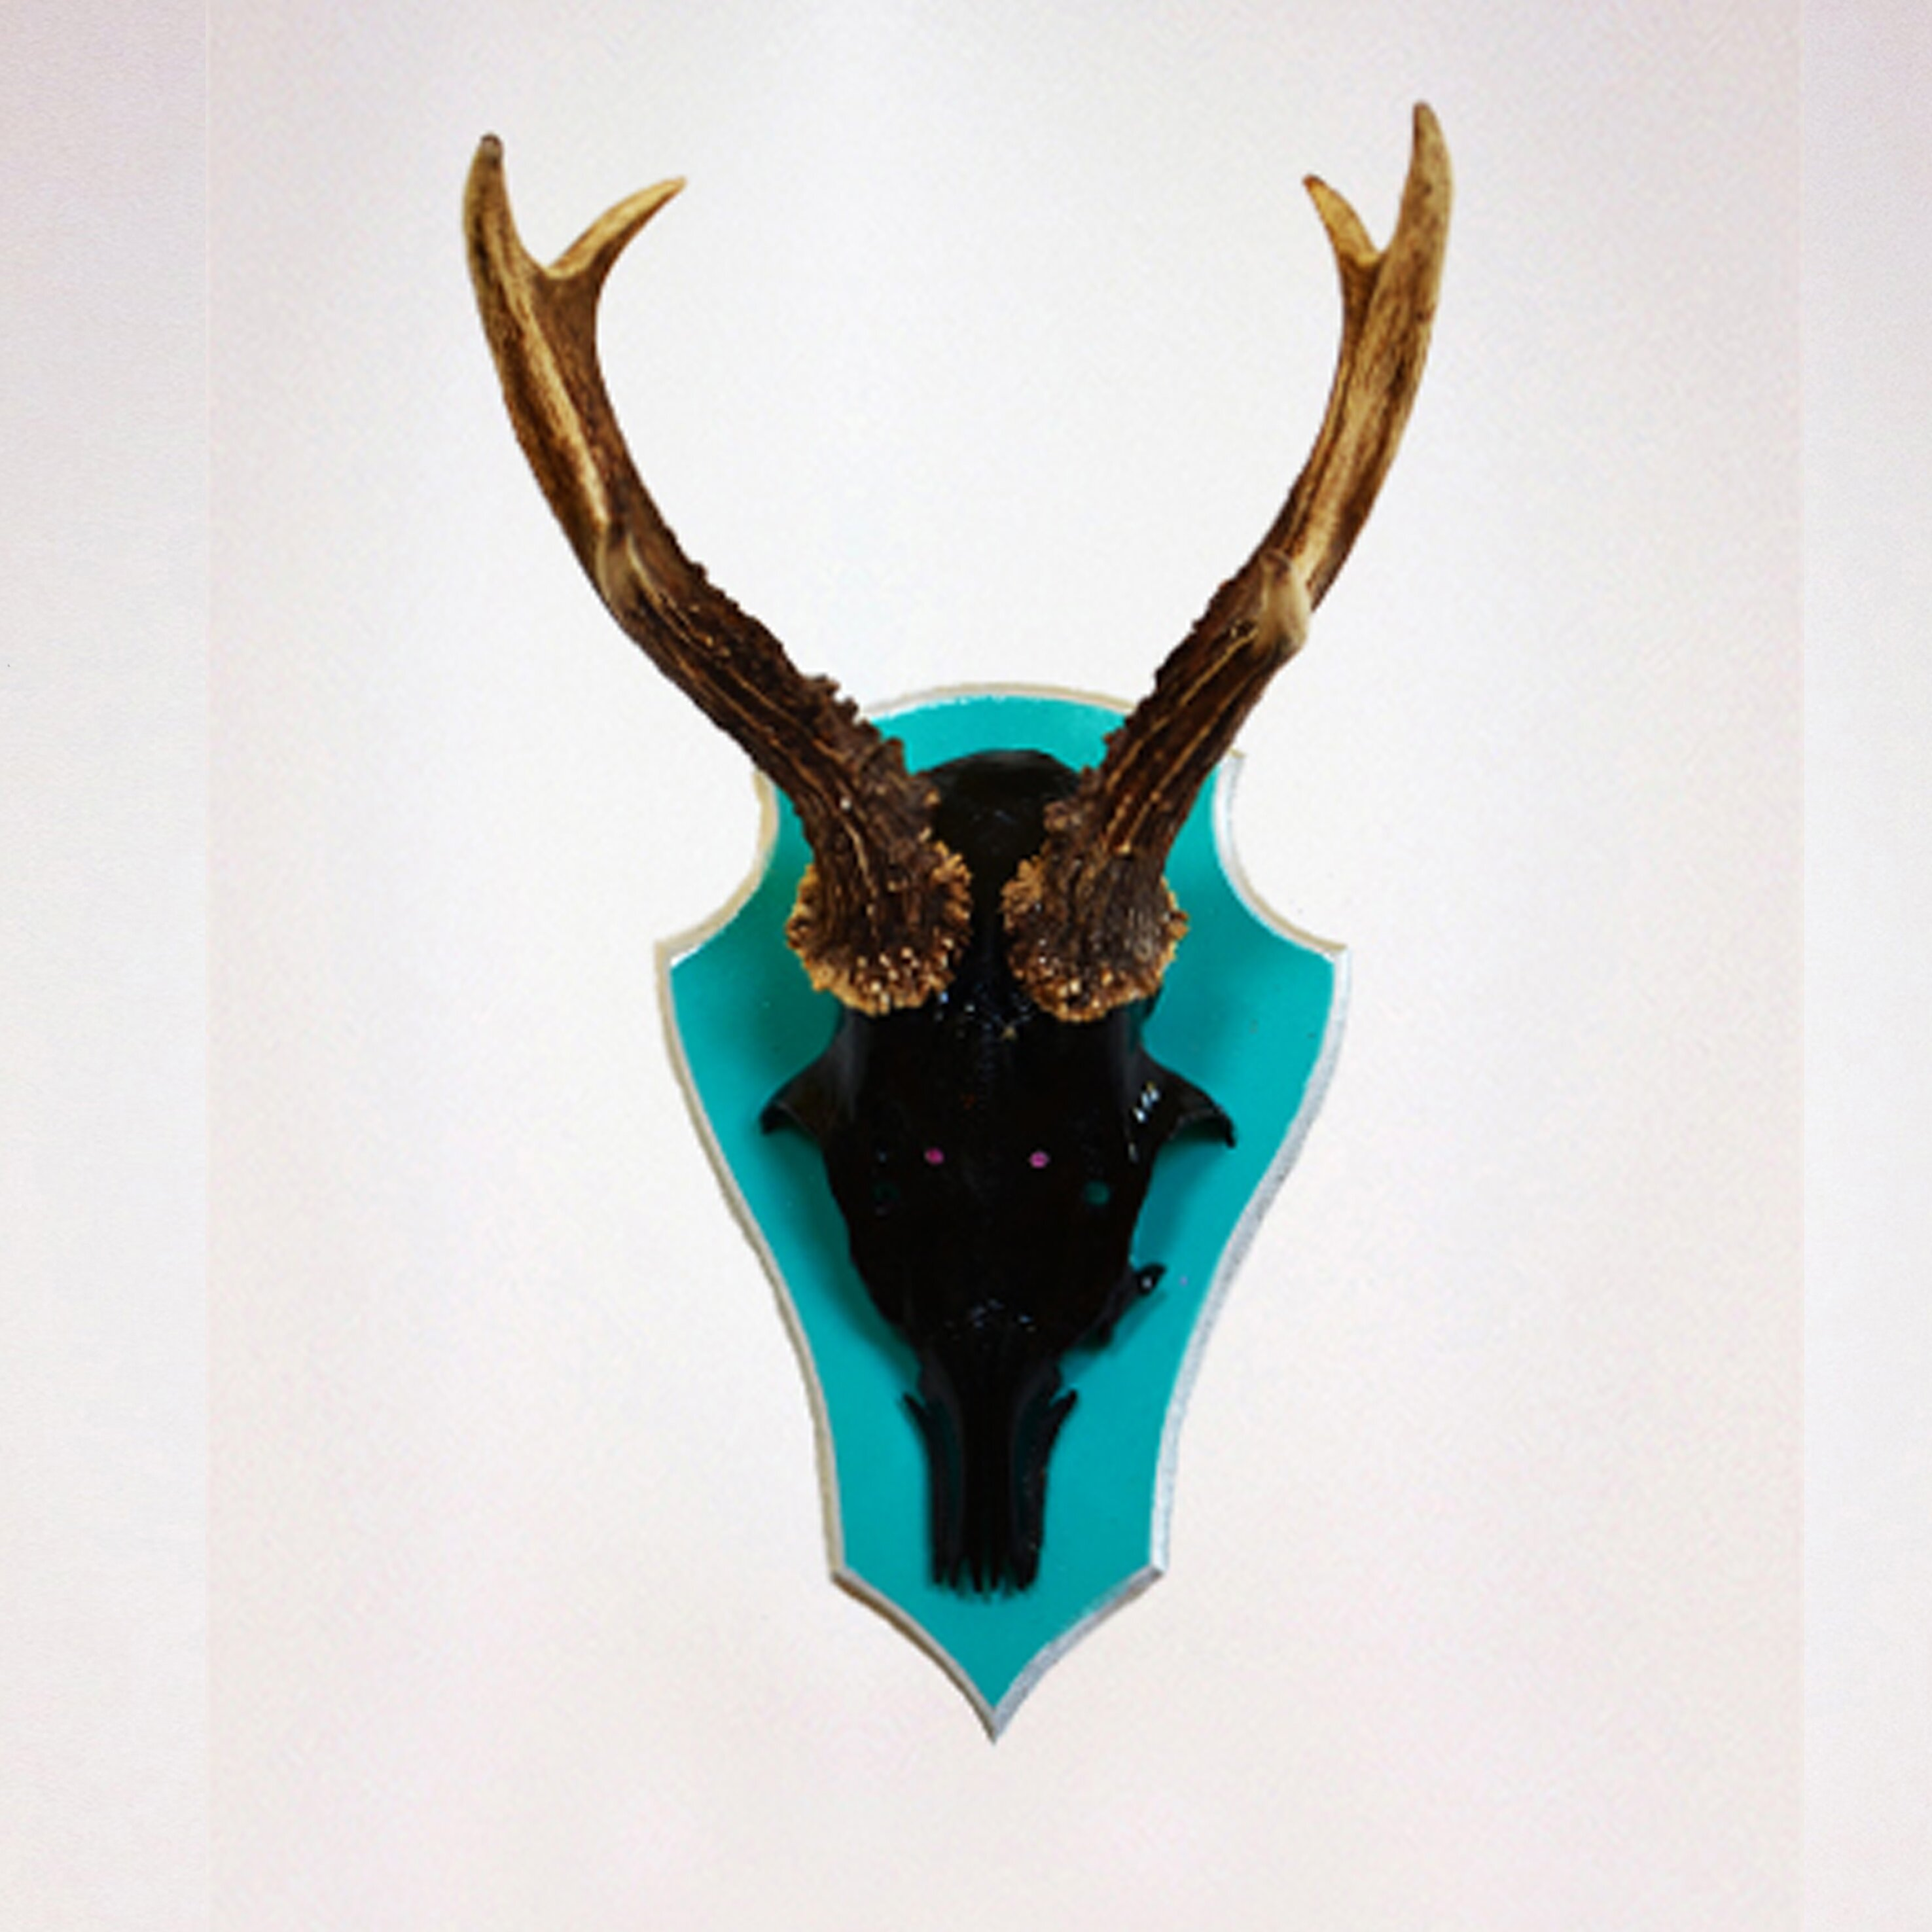 Heartelier verei antlers wall d cor wayfair uk for Antlers decoration